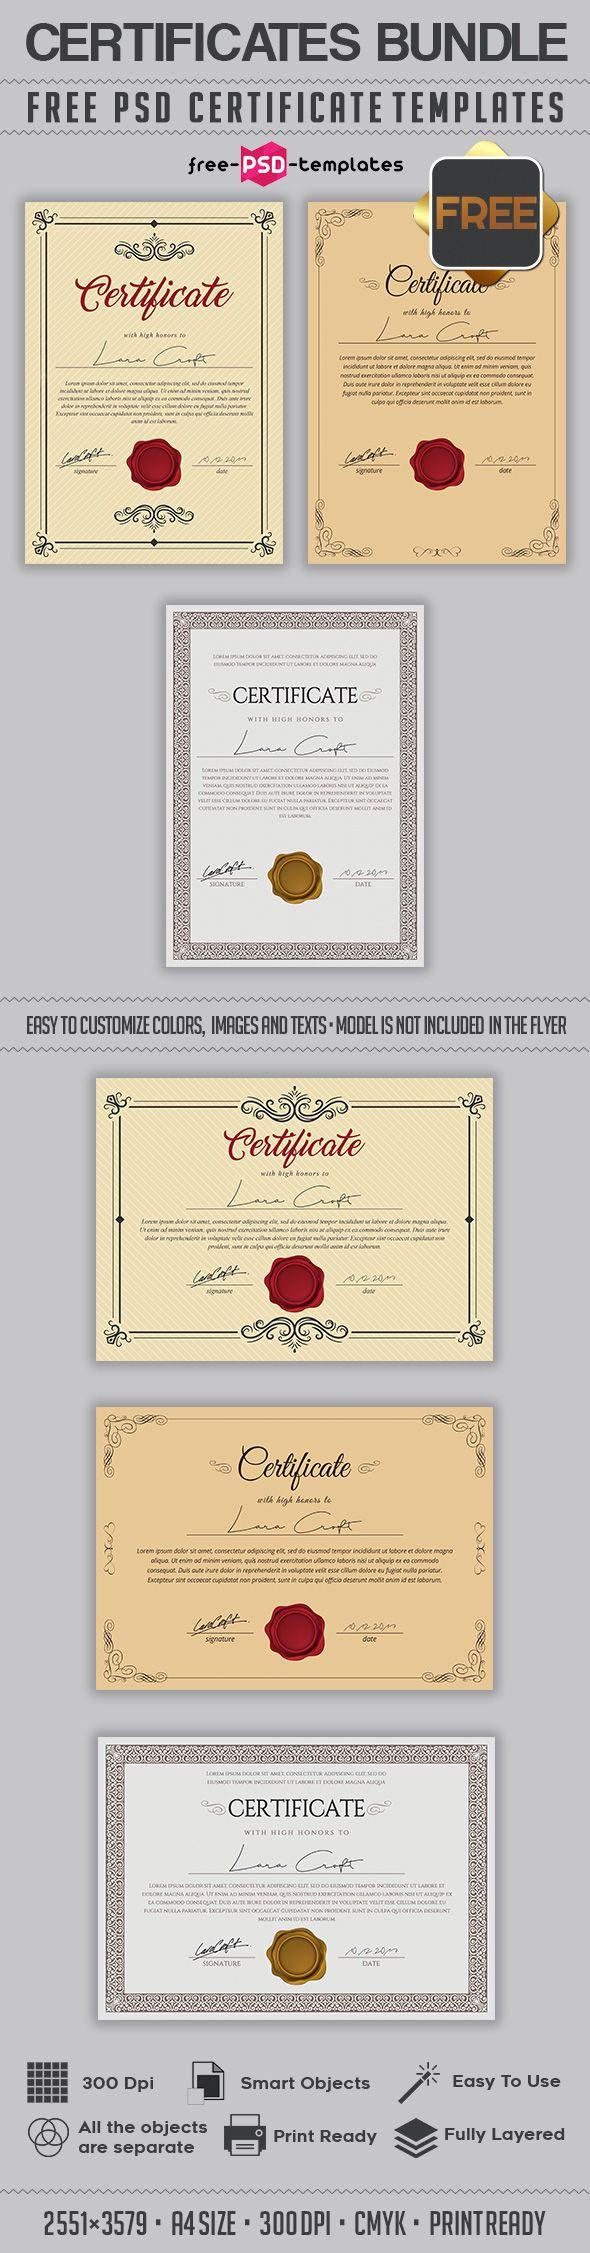 Free Psd Multipurpose Certificates Template 491 Mb Free Psd